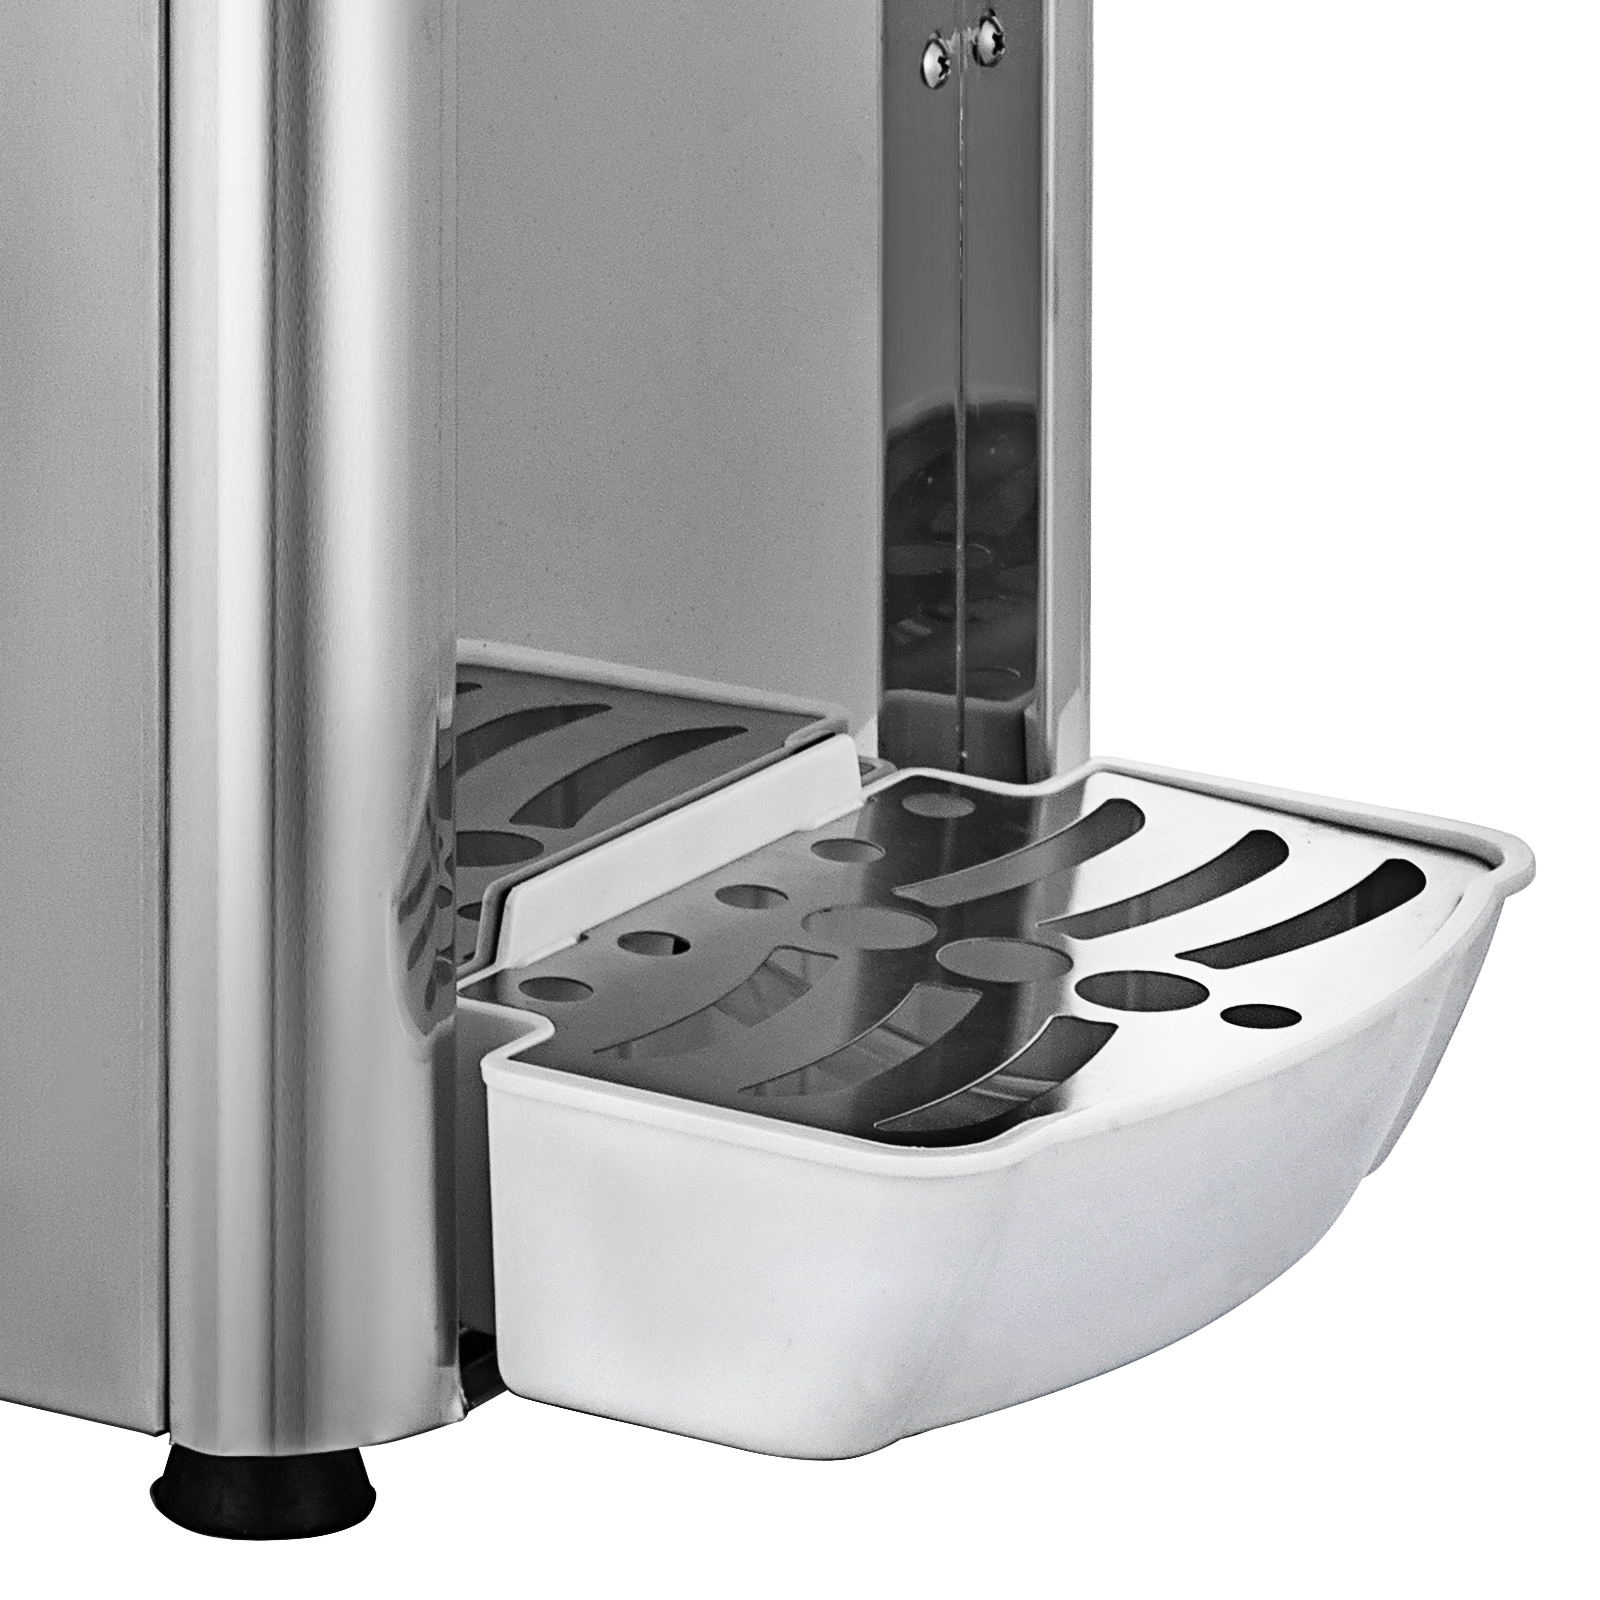 Easier Cleaning Stainless Steel Commercial 18L 4.75Gal Hot Cold Drink Juice Dispenser Beverage Milk Juicer